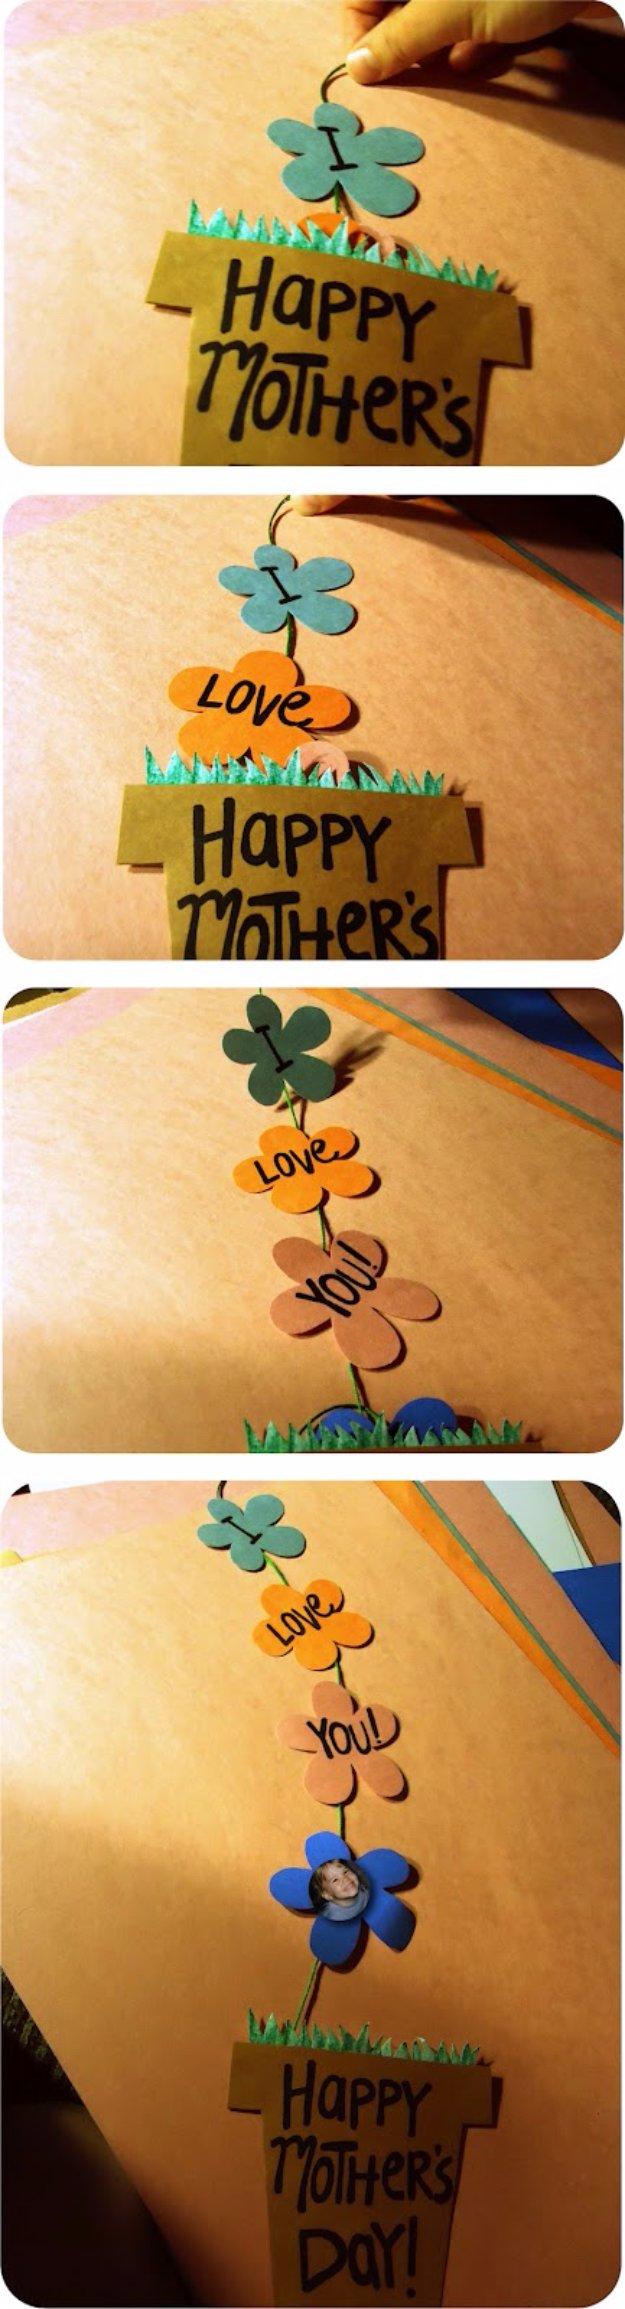 48 DIY Mother's Day Flower Pot Card